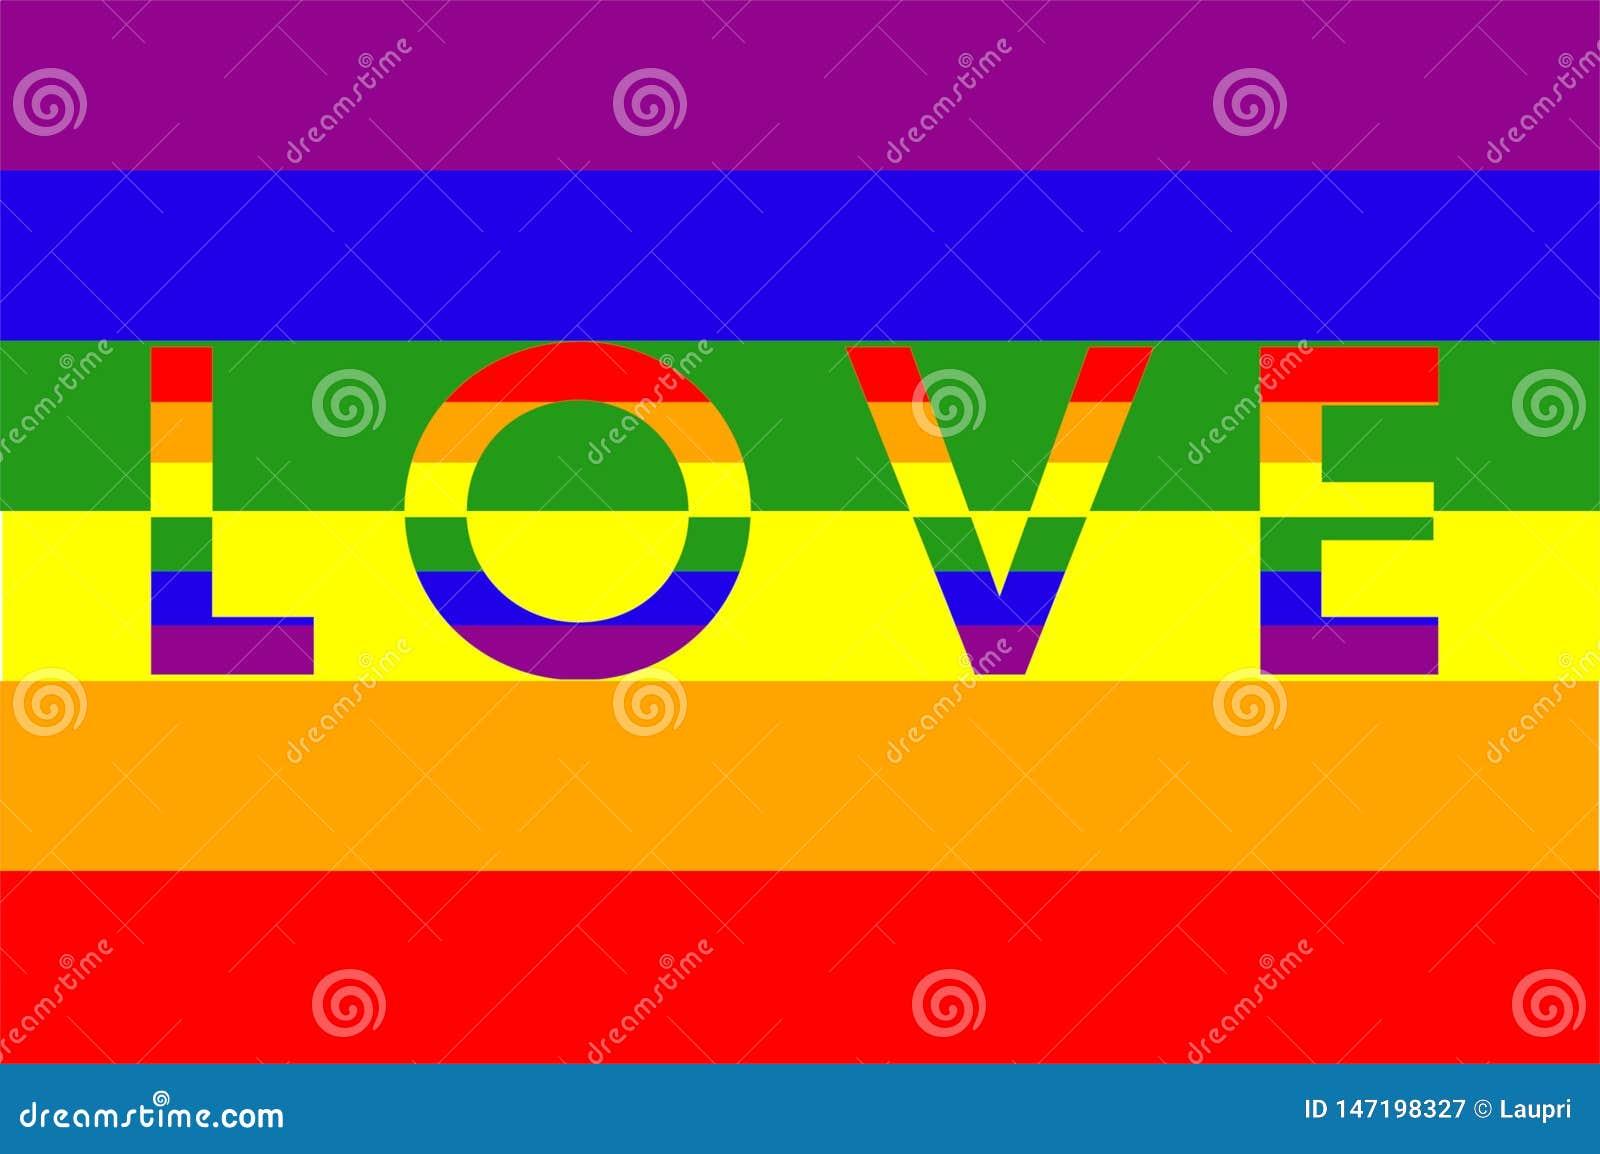 Bandera Arcoiris Movimiento Lgtbi Stock Illustration Illustration Of Drawn Graphic 147198327